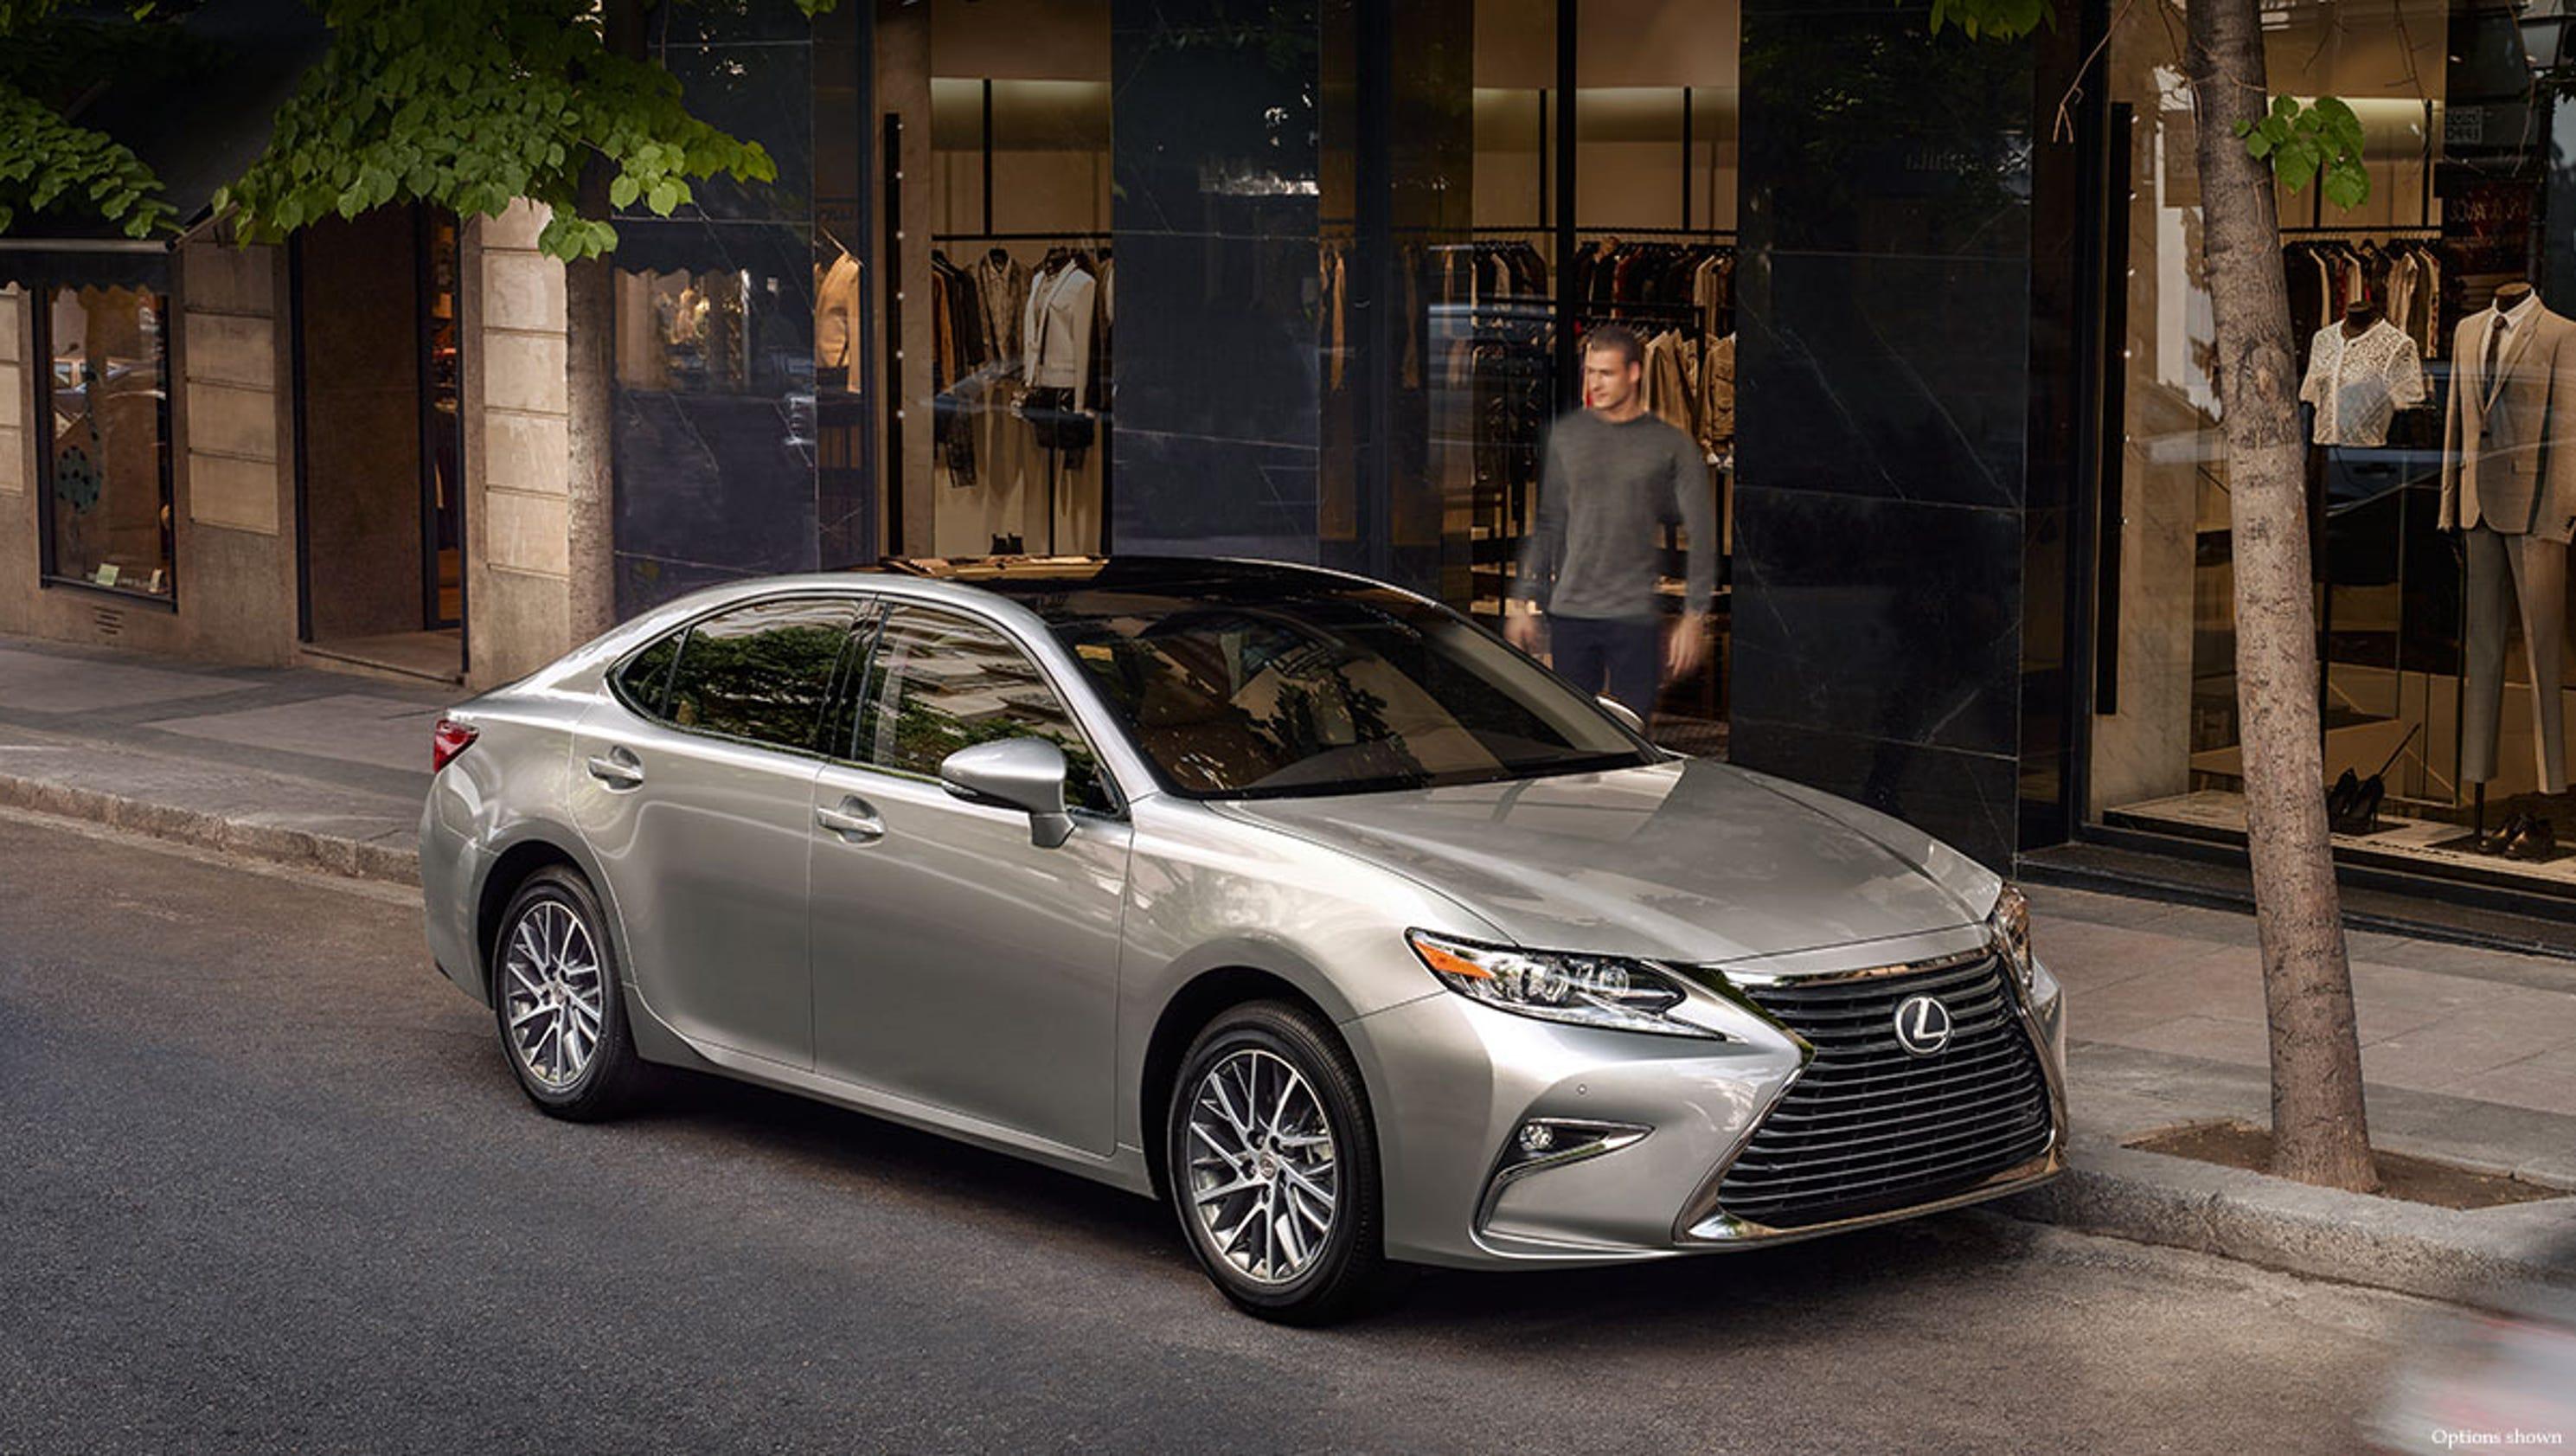 es luxury com hybrid sedan gallery lex esh white overlay lexus eminent pearl models